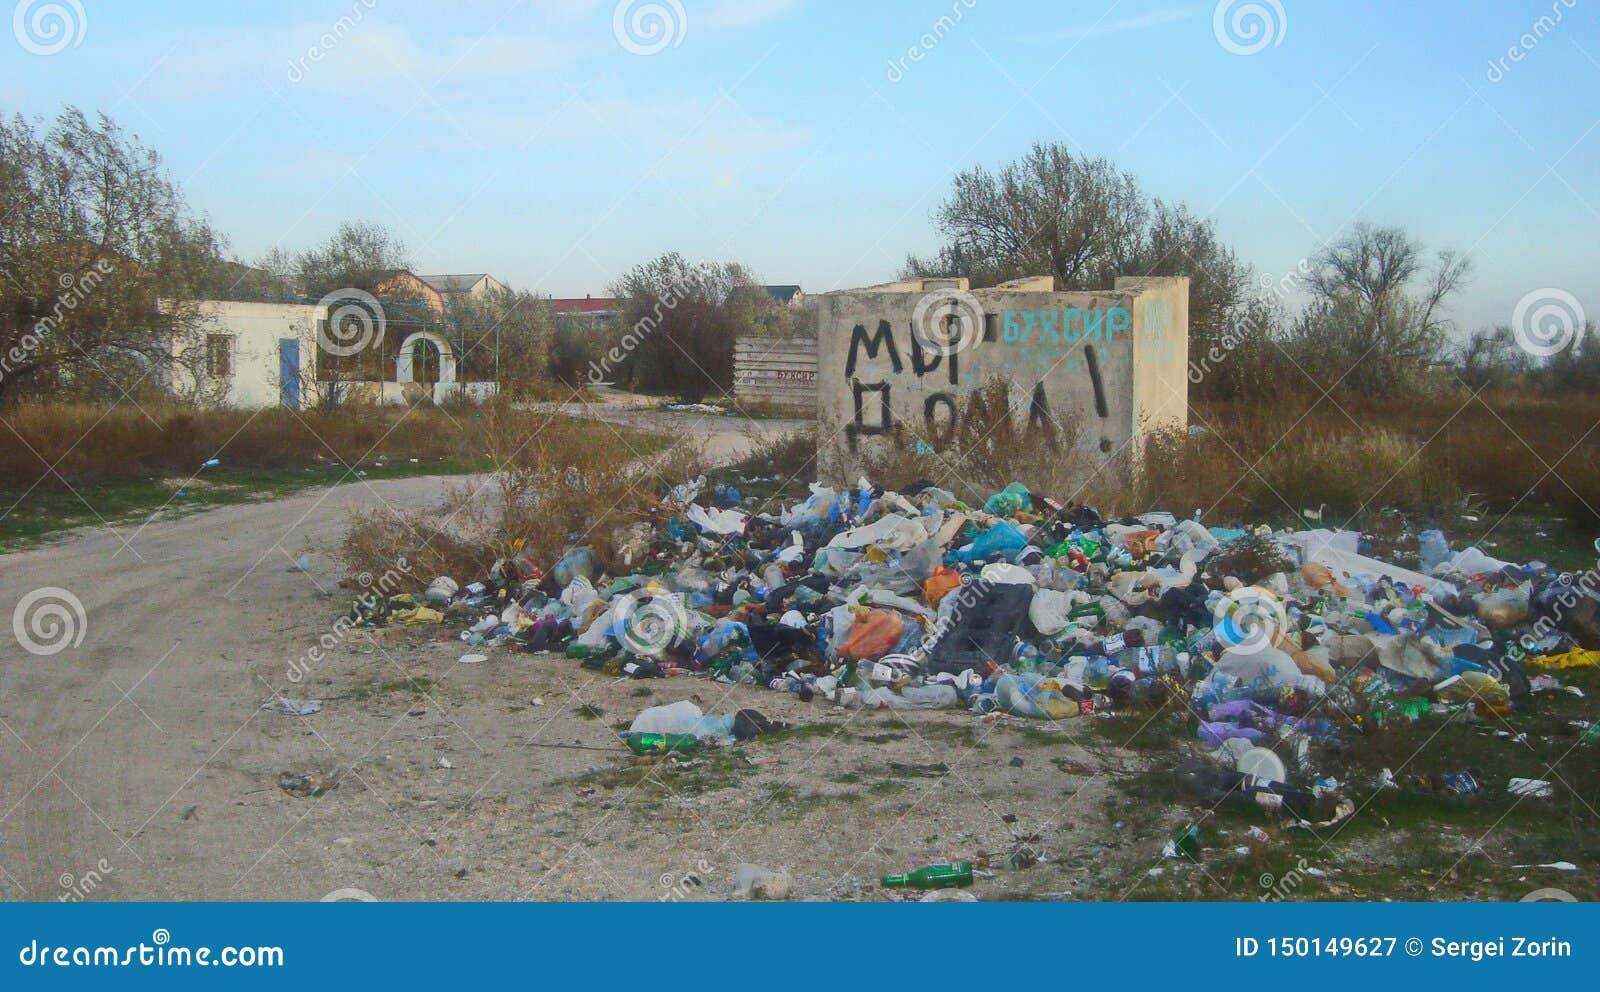 Spontaneous dumping of household garbage near residential houses